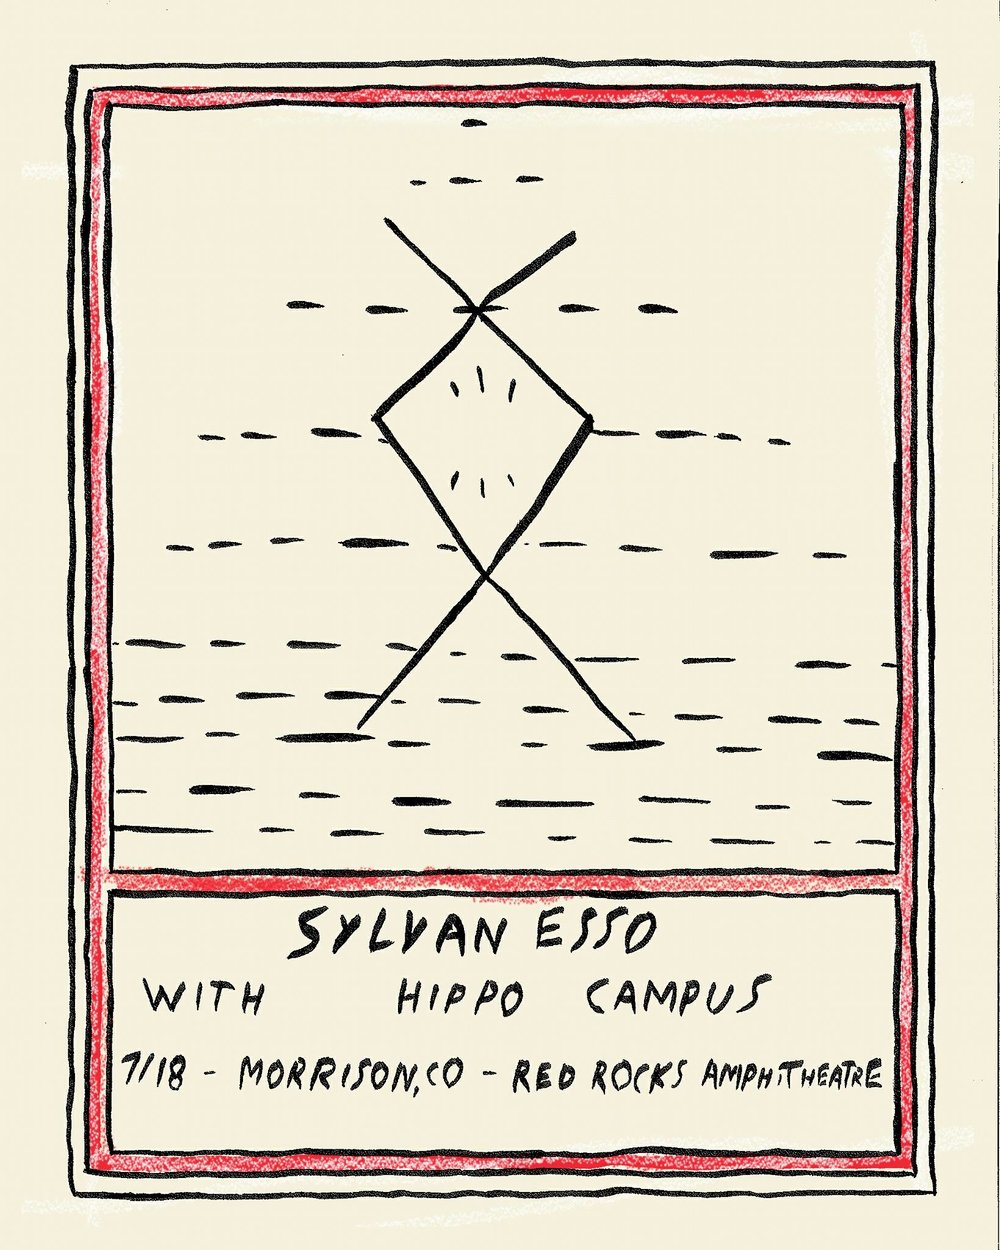 Sylvan-Esso-Red-Rocks.jpg